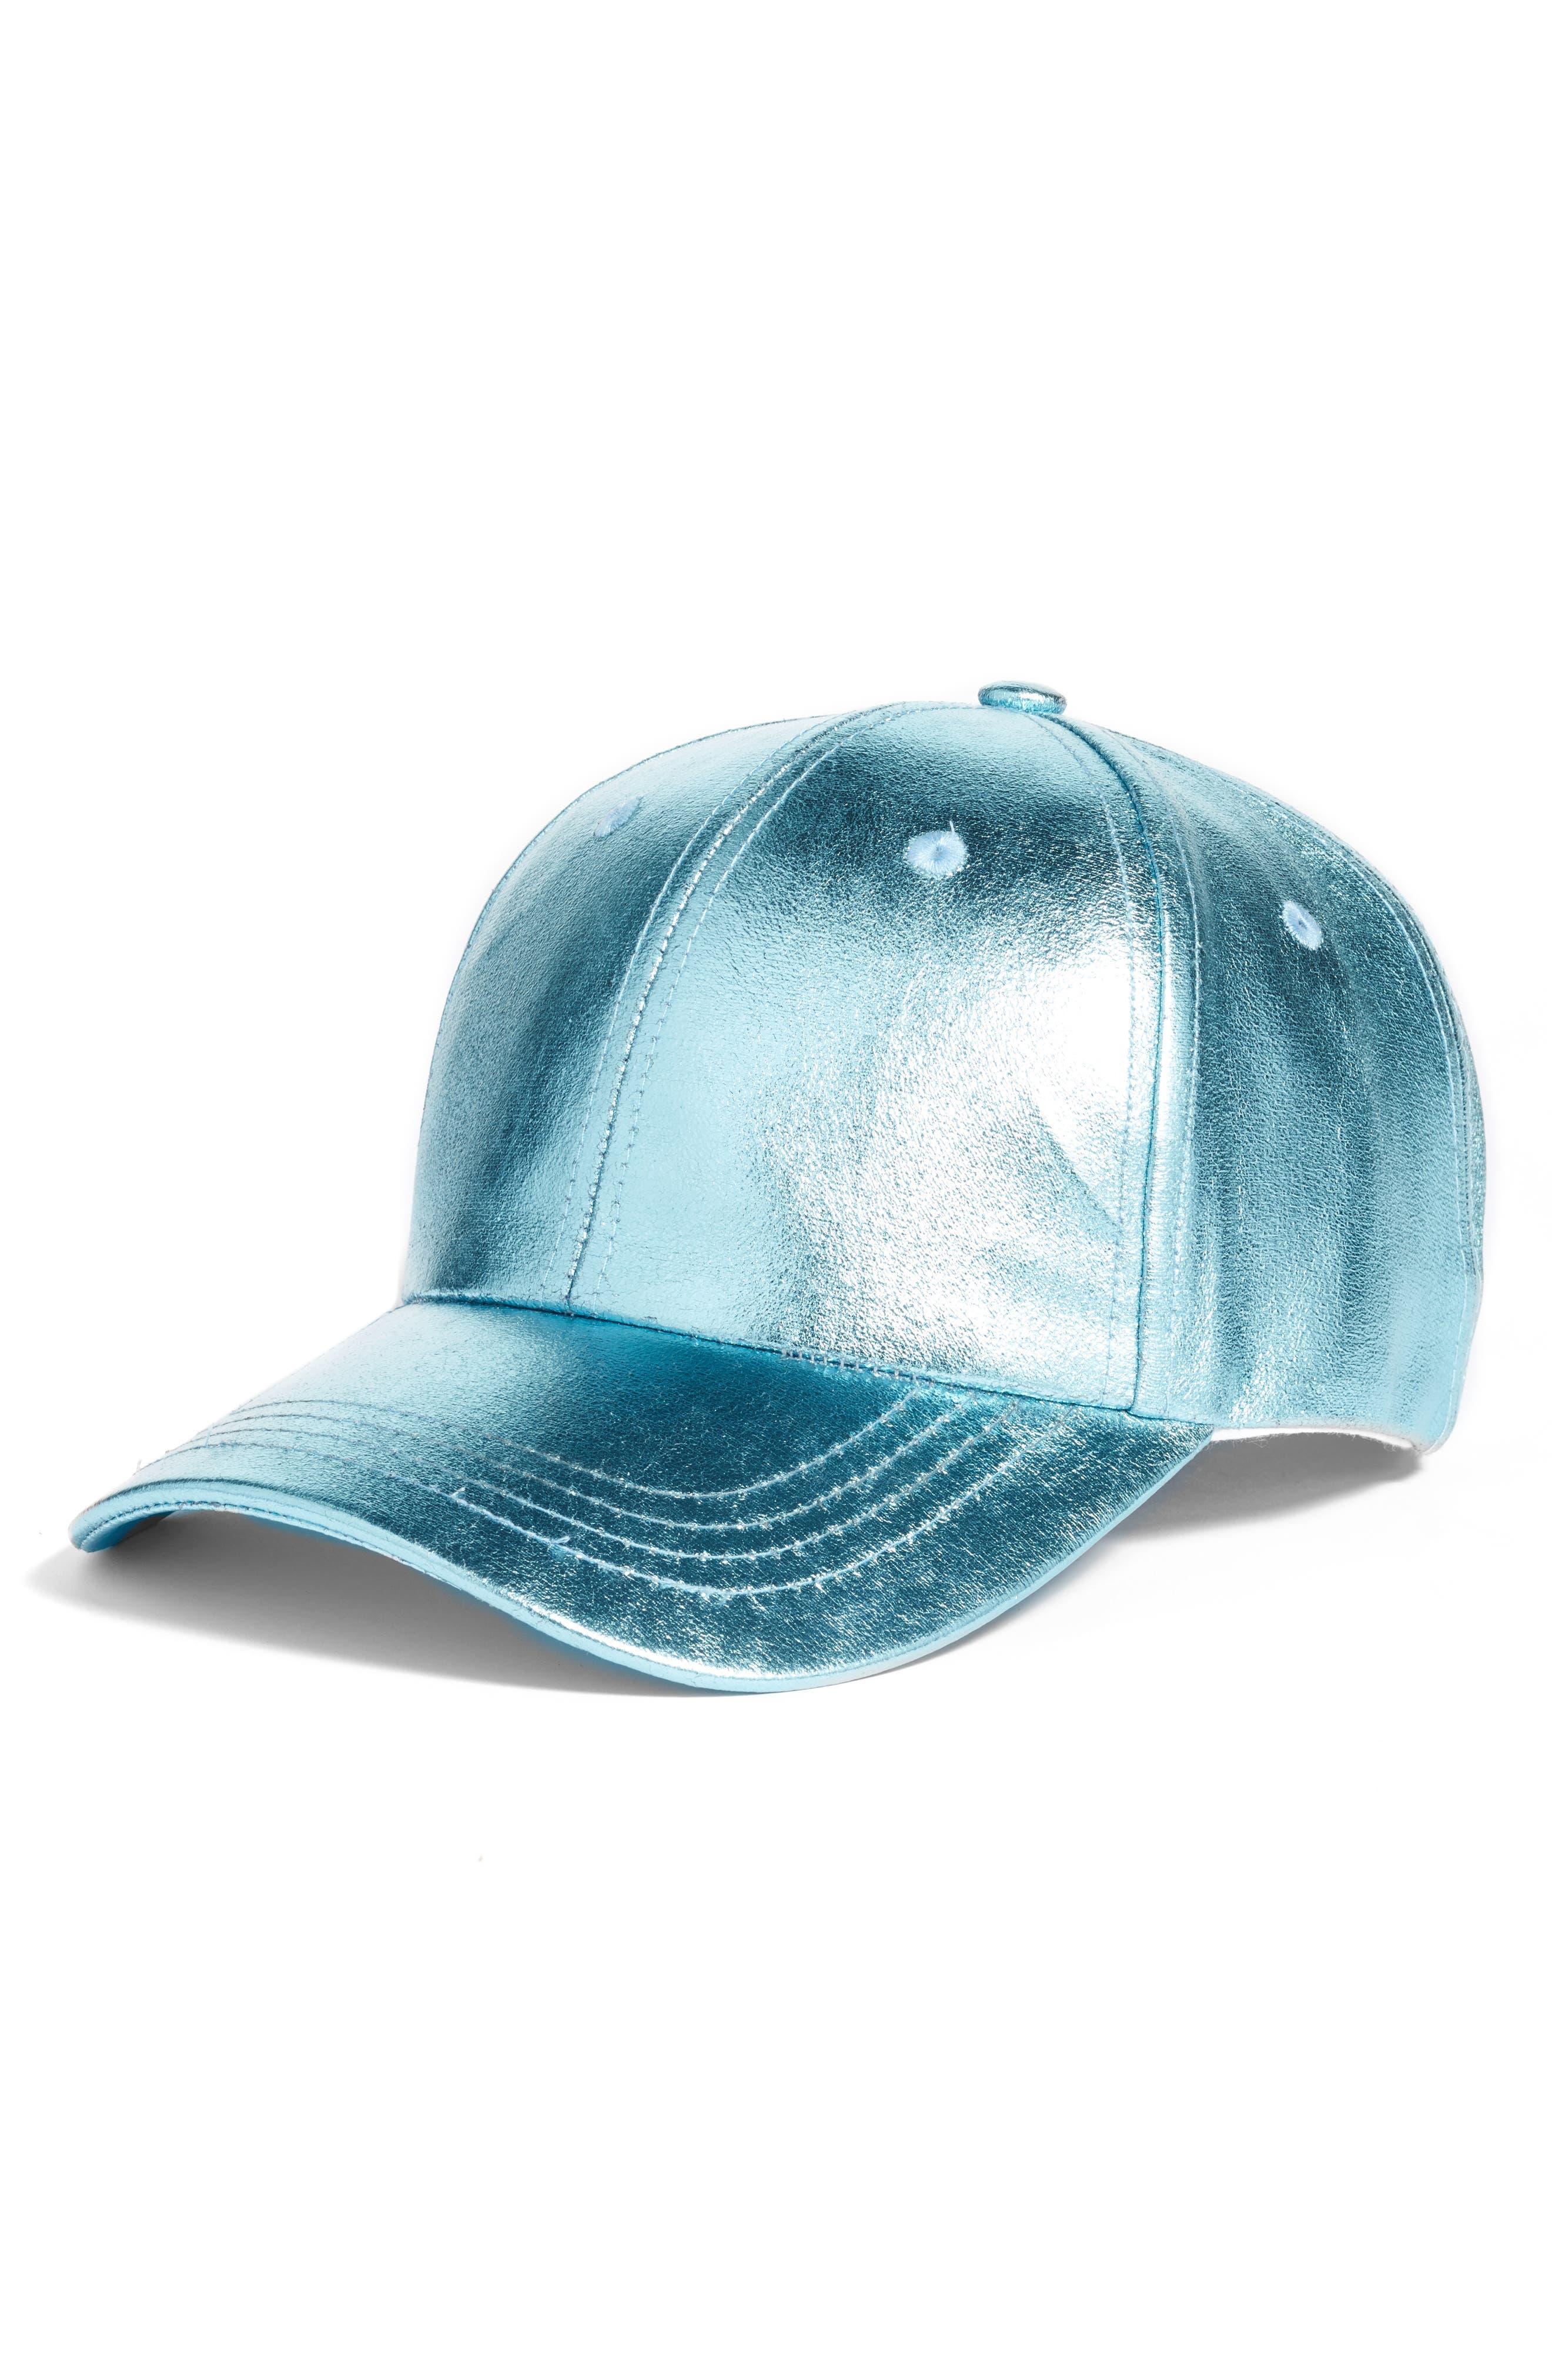 Crackled Metallic Baseball Cap,                             Main thumbnail 1, color,                             Blue